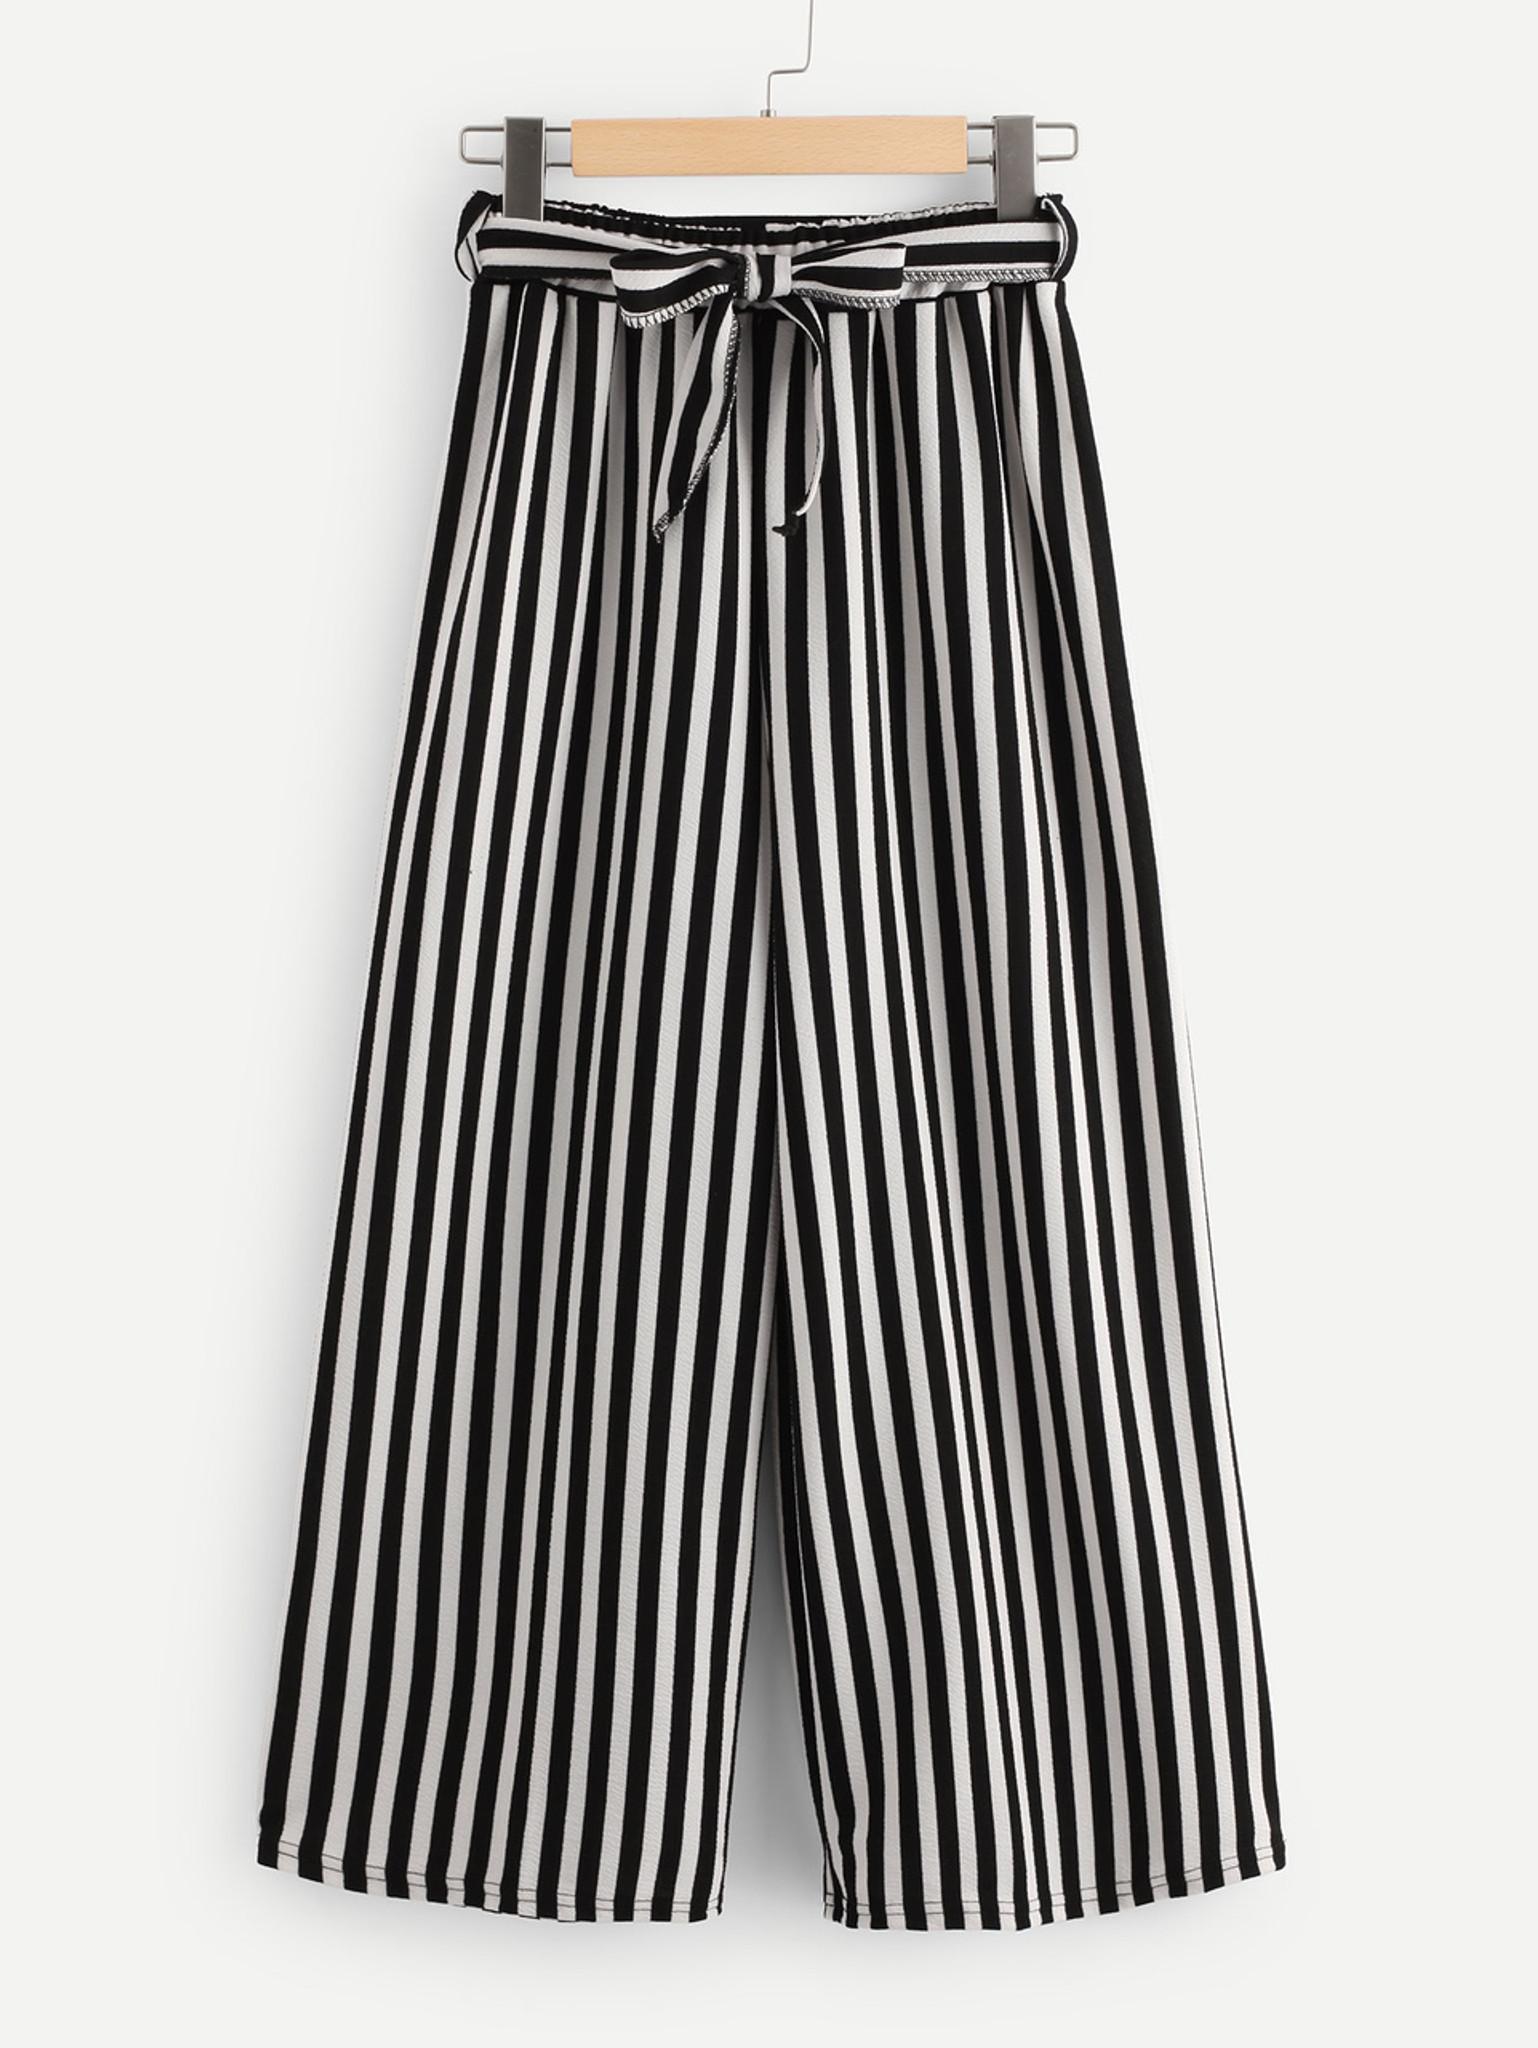 Fifth Avenue Viscose MOJA Stripe Tie-Waist Culotte Pants